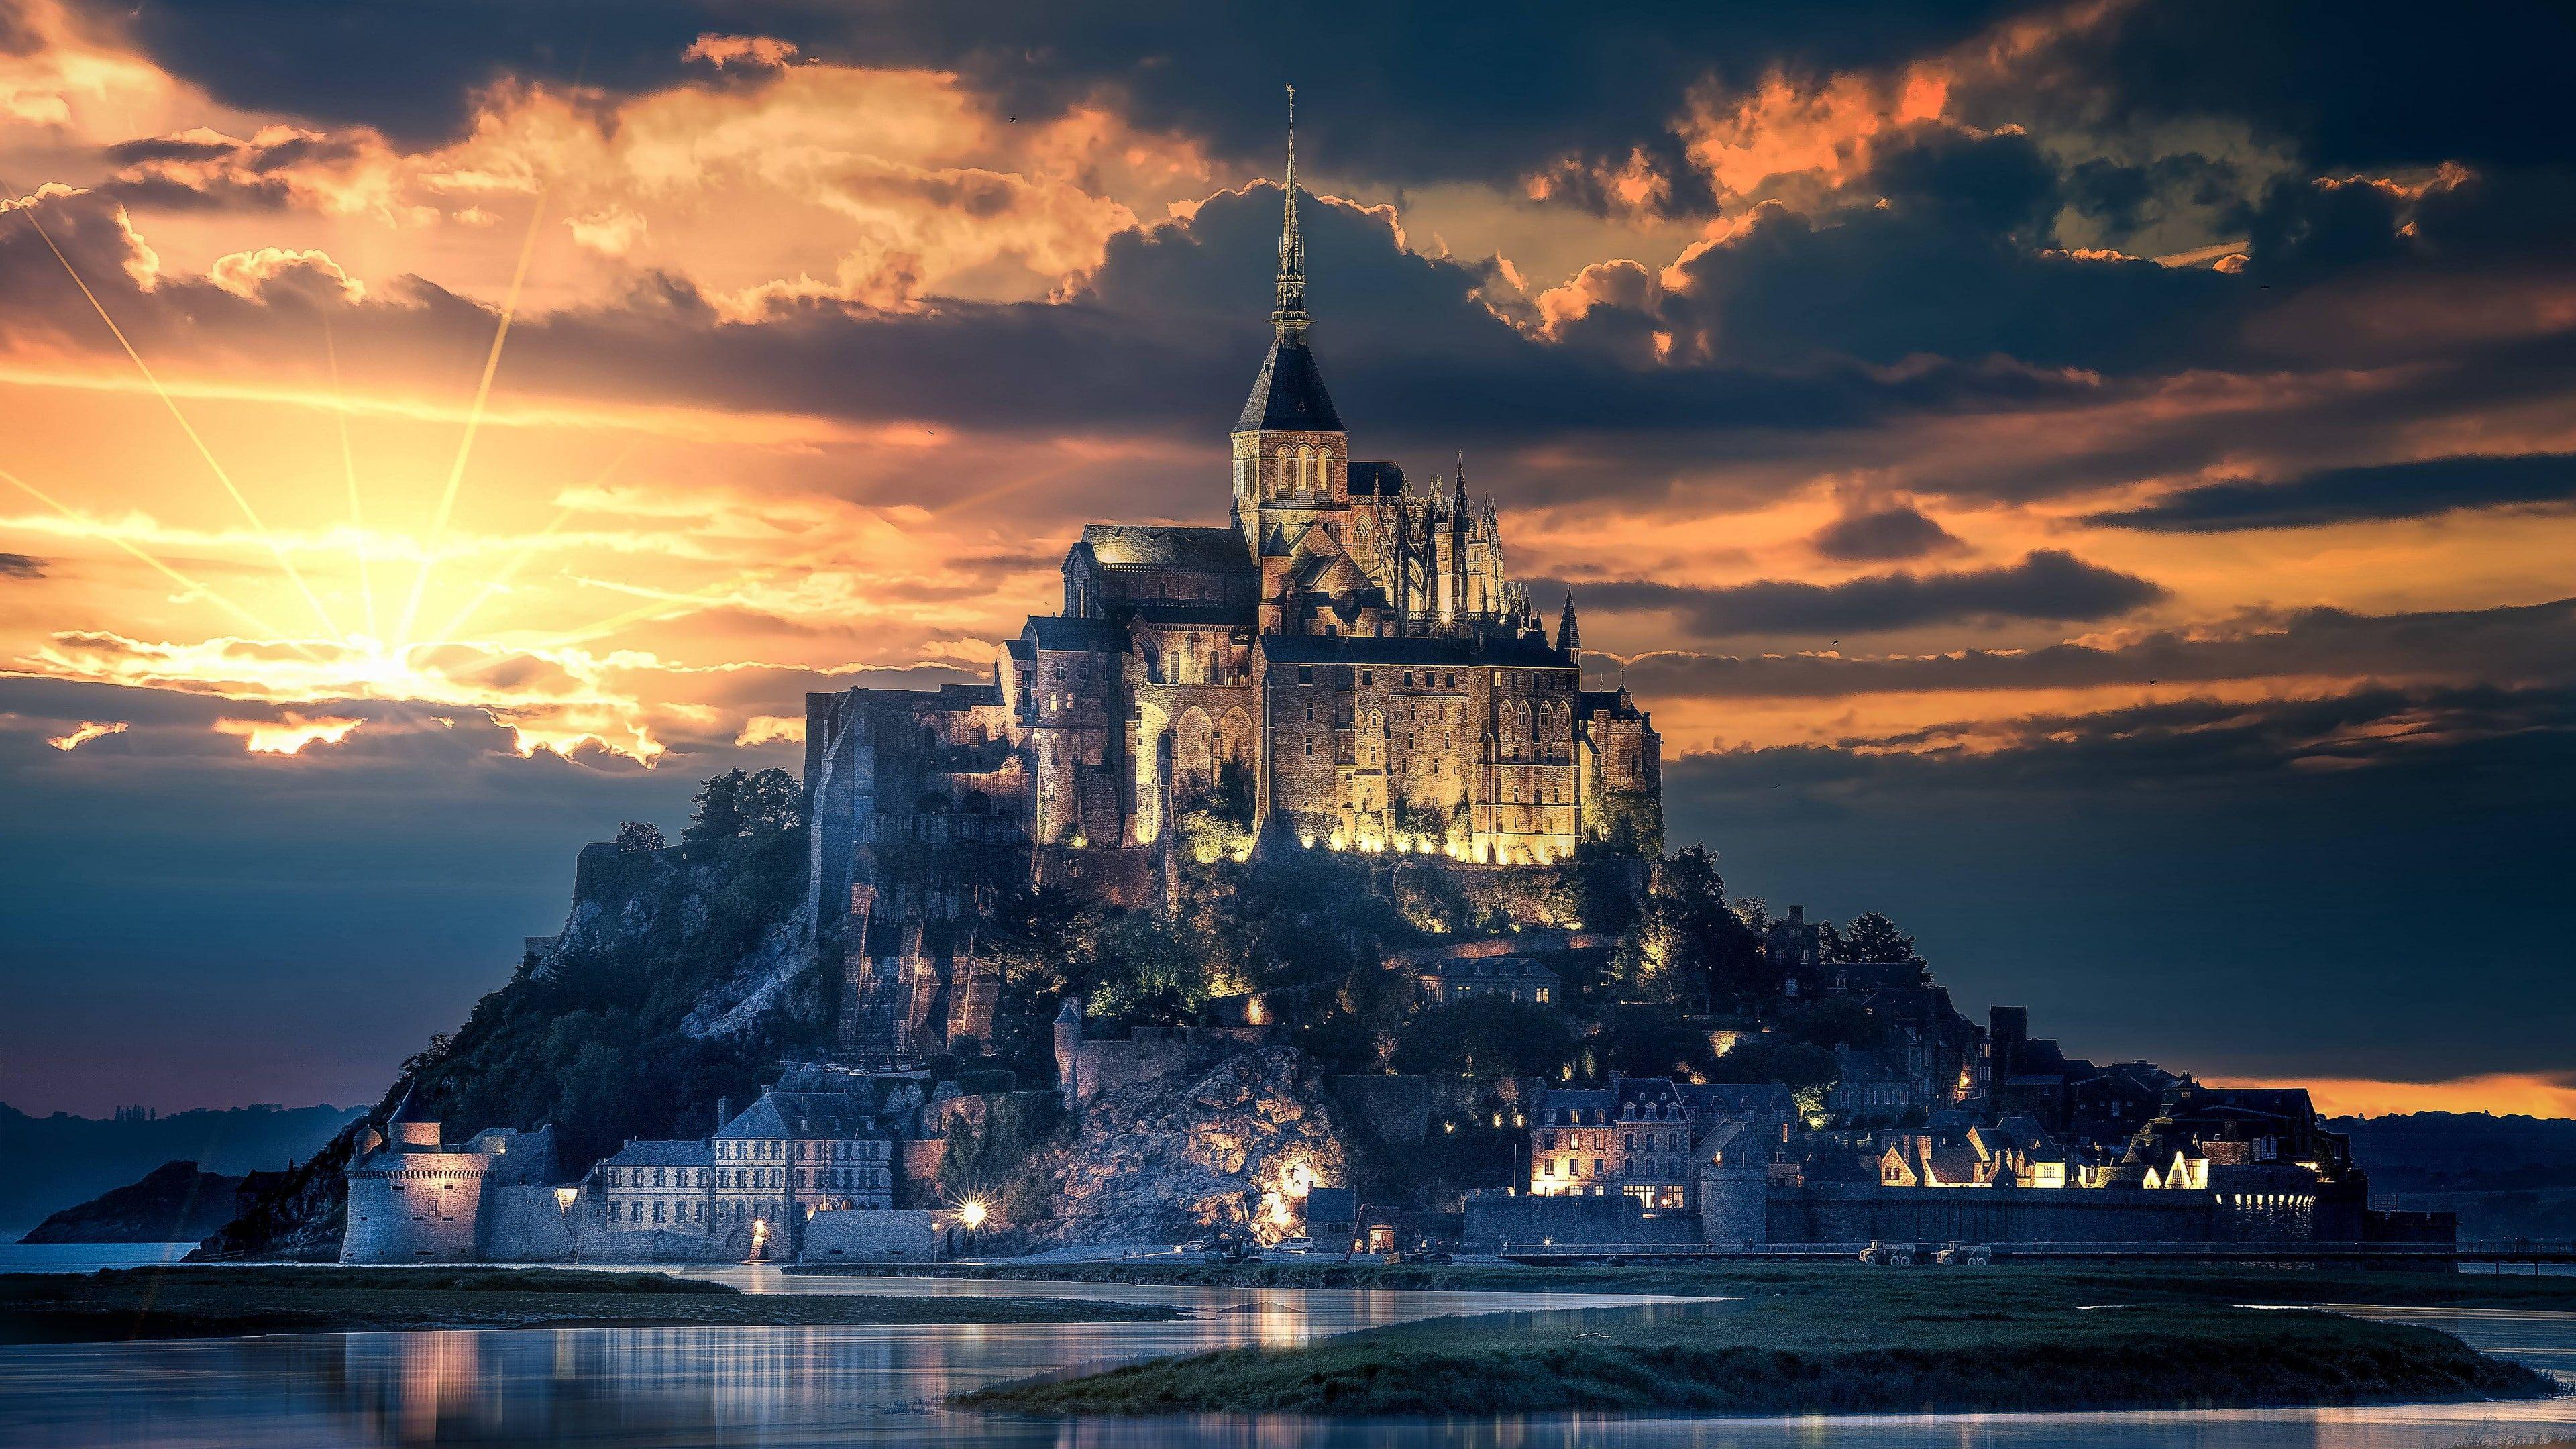 Mont Saint Michel Mont Saint Michel Abbey Normandy France Europe Monastery 4k Wallpaper Hdwallpaper Desktop Wallpaper Bichinho Cenario